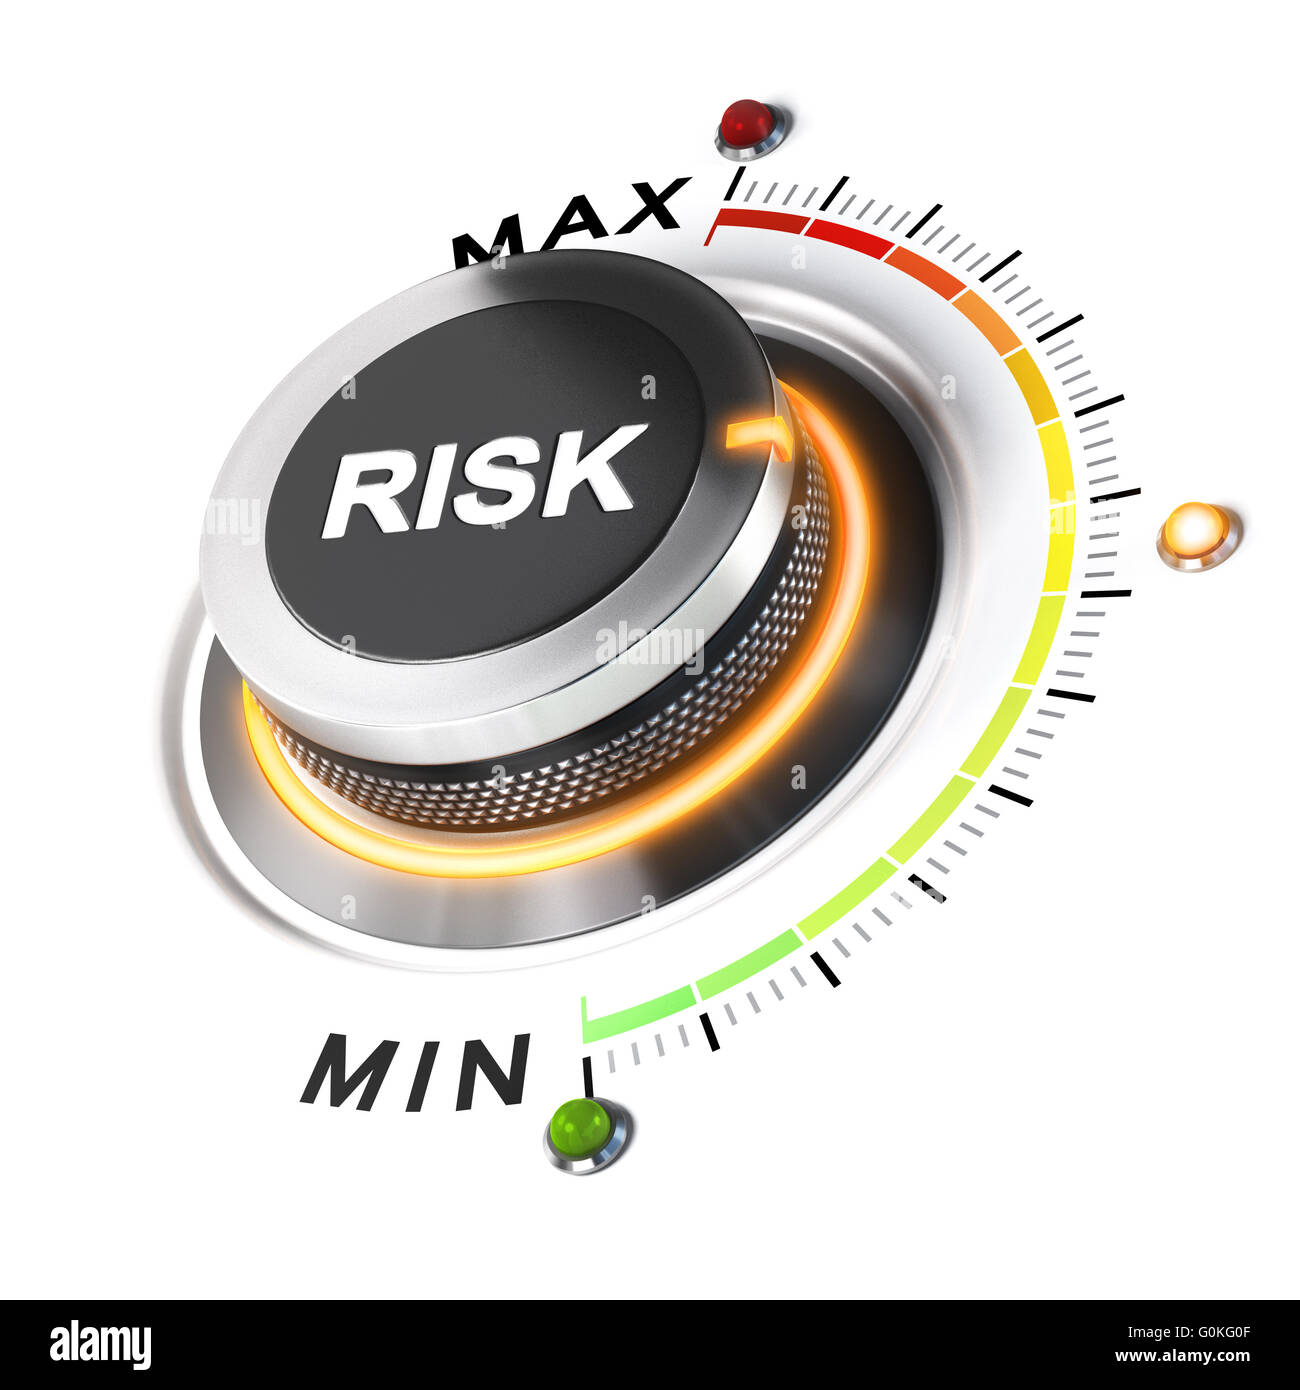 Risk level knob positioned on medium position, white background and orange light. 3D illustration concept for business - Stock Image